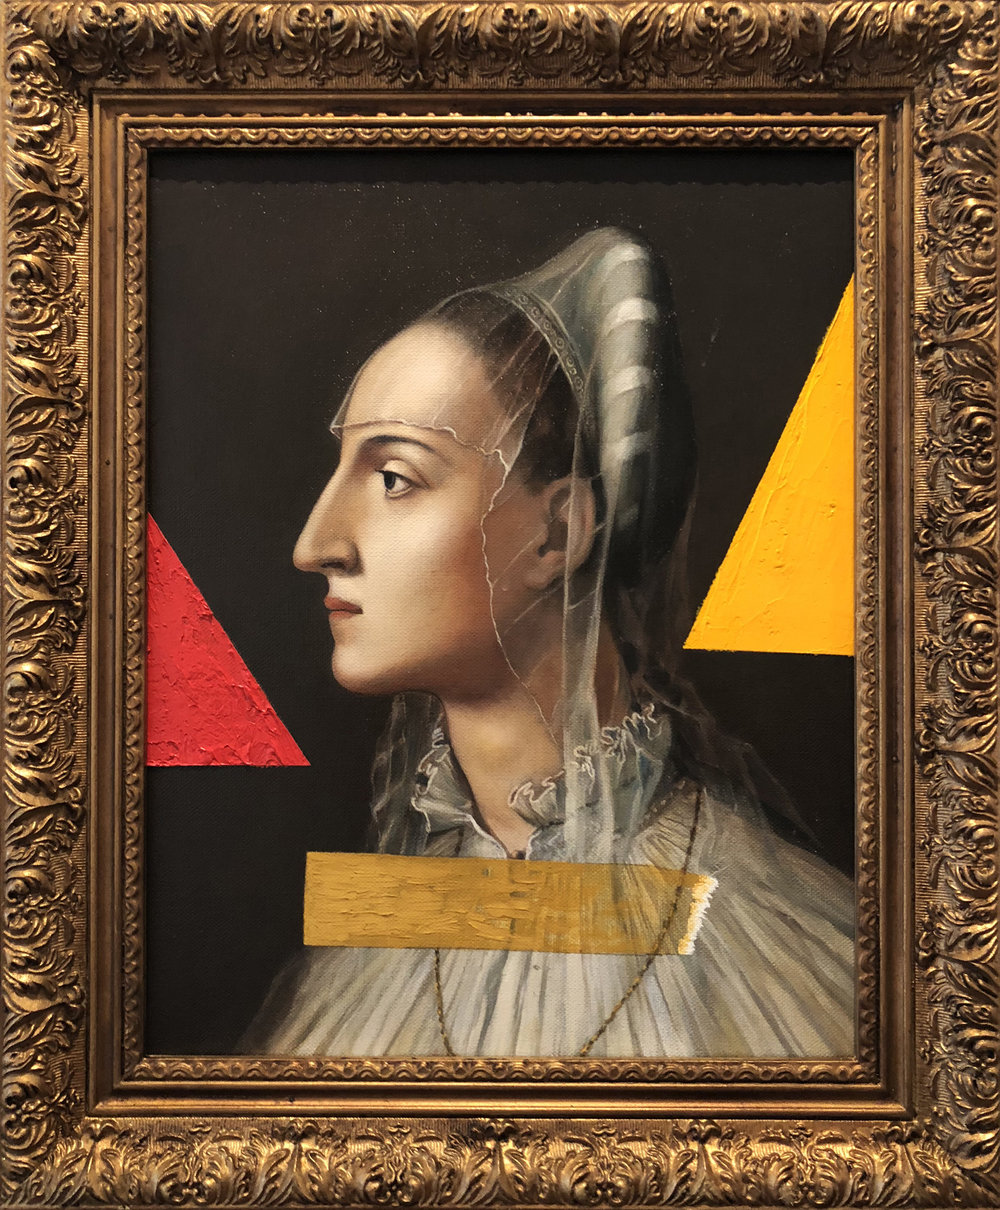 Untitled - Bronzino 1 (Paradigm Series), 14 x 11 inches / 35.5 x 28 cm, oil on canvas, 1998